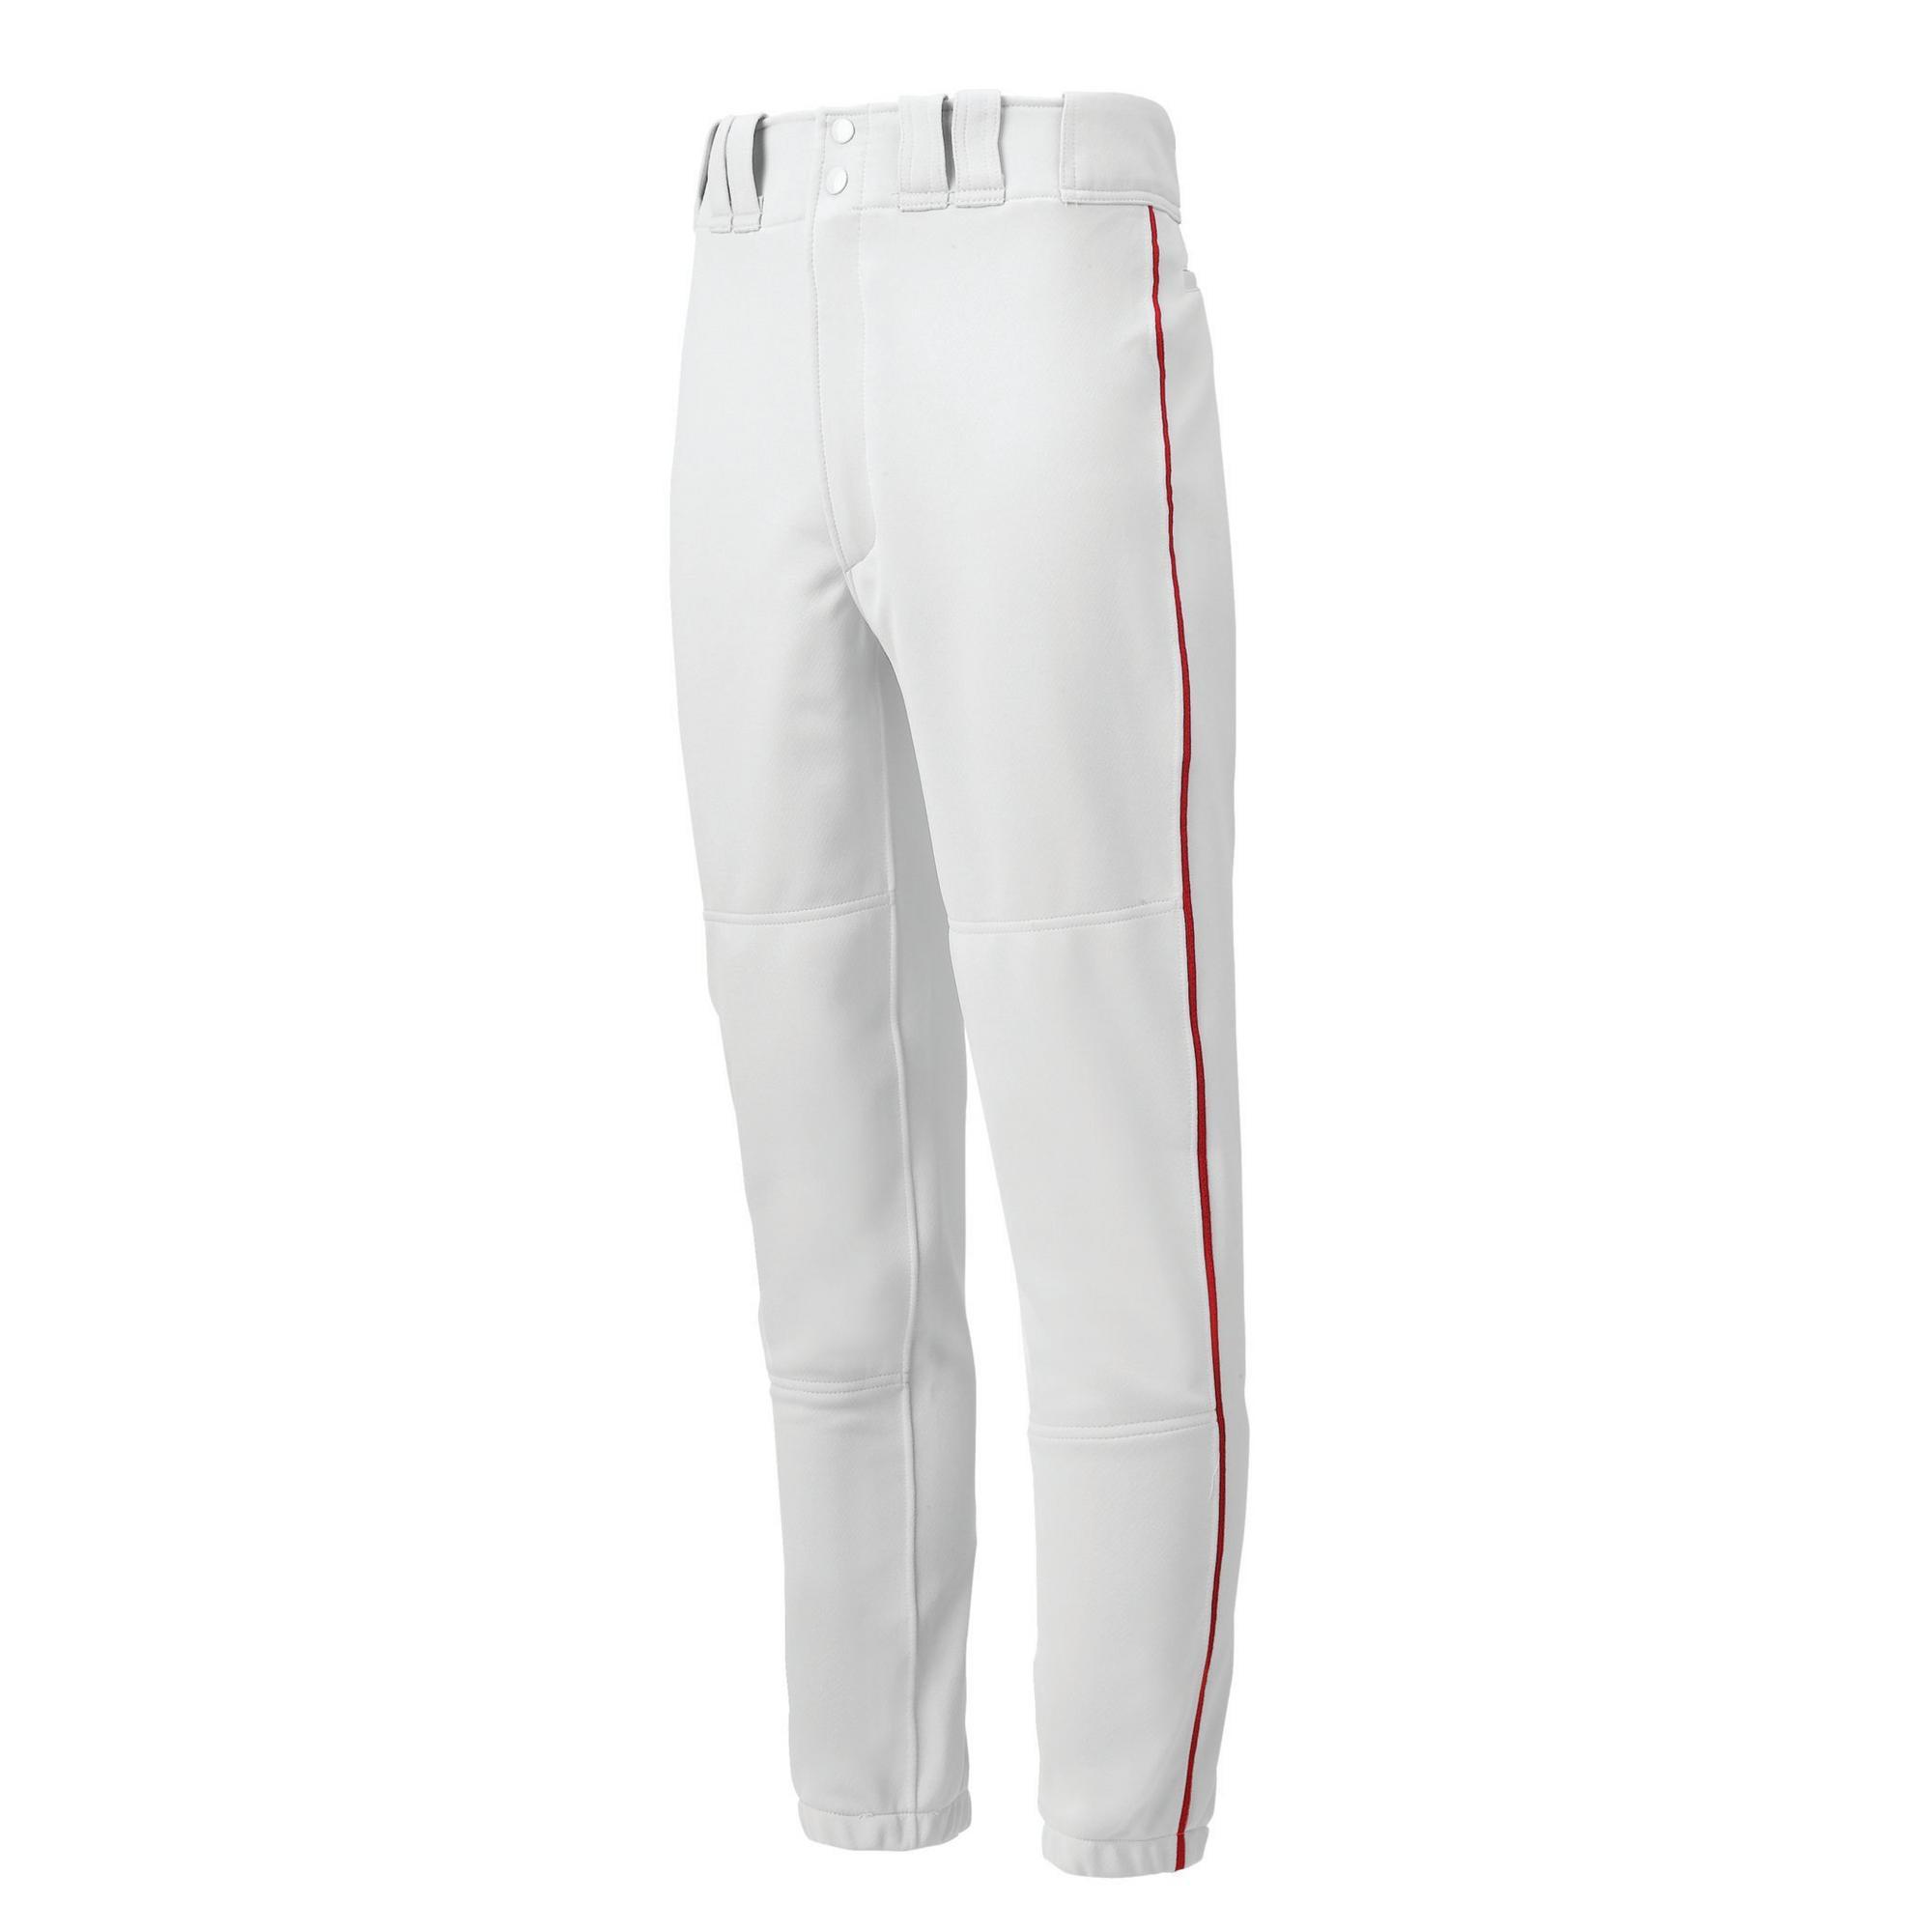 0f4b5ec4993 Youth Select Piped Baseball Pant (Youth X-Large